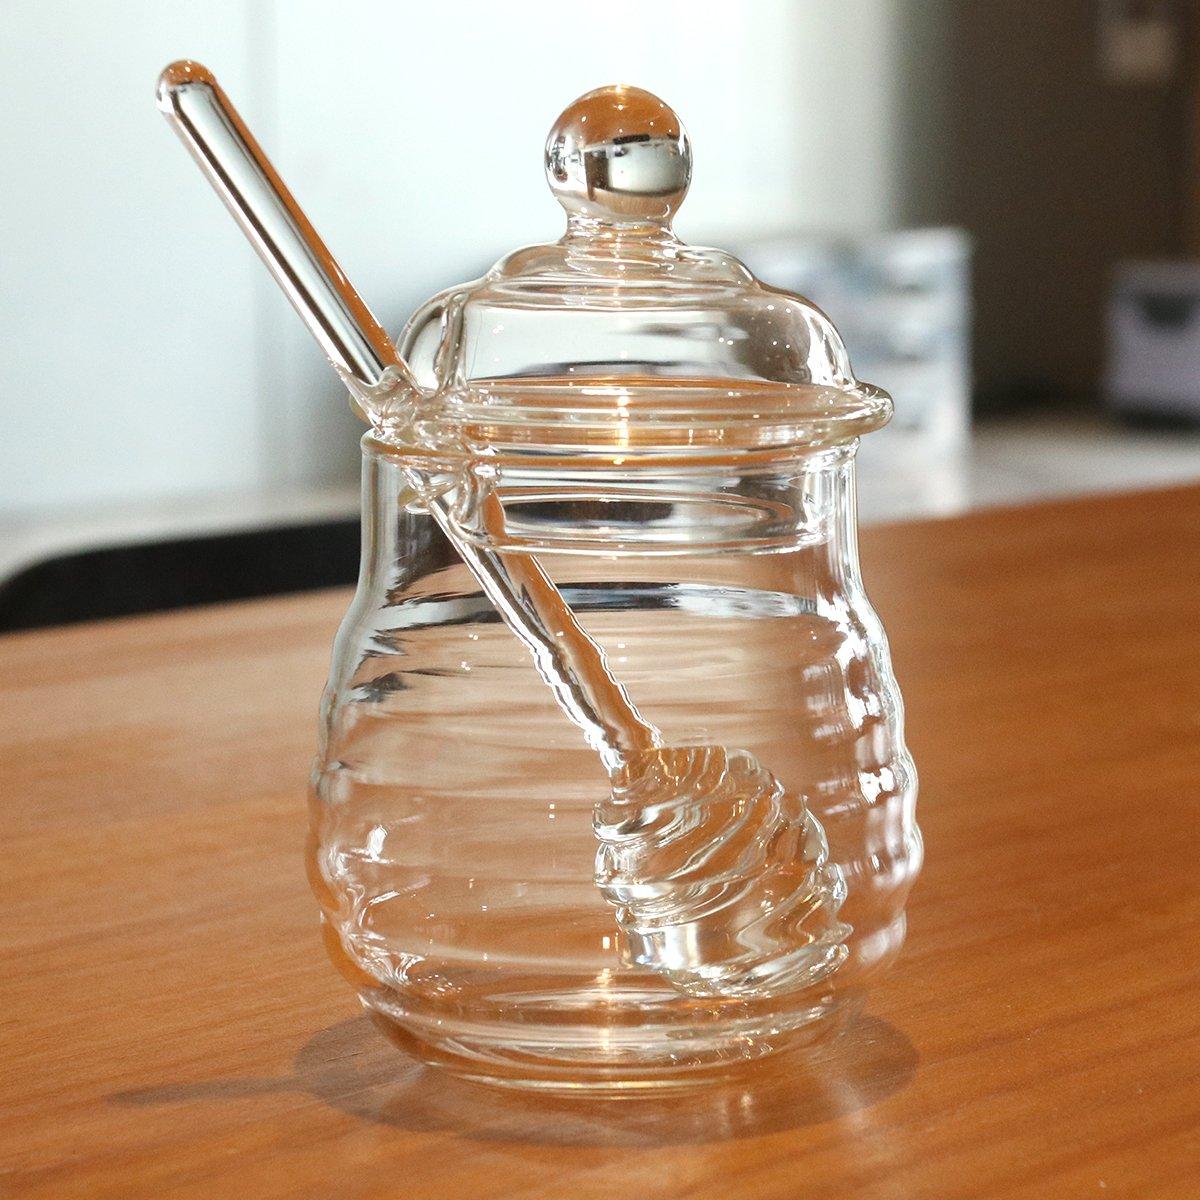 BESTOMZ of Glass Honey Jar//Pot Of Honey//Jam Pot with Ladle 250/ml Transparent